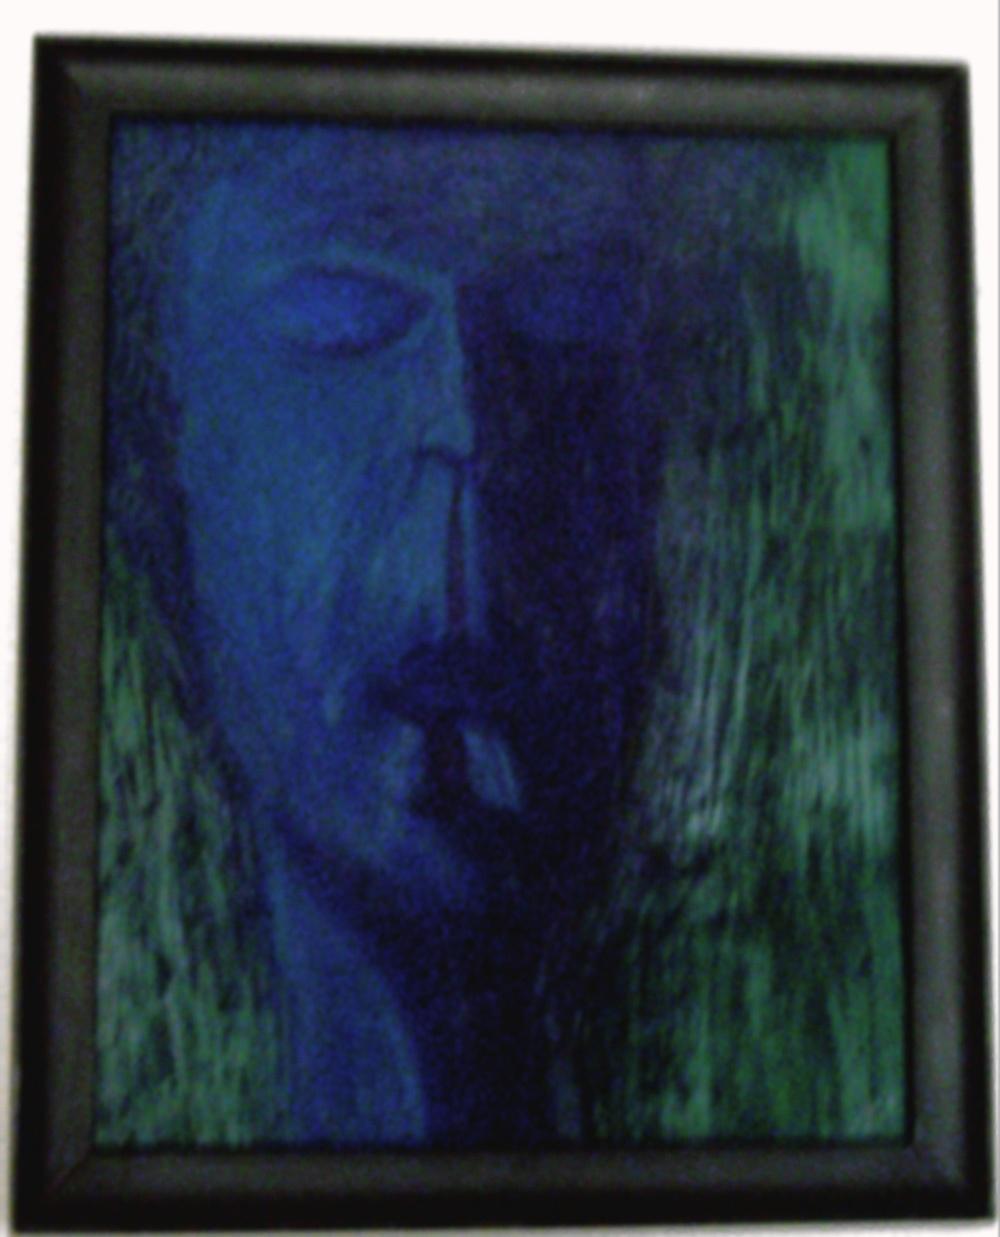 "Self Image in Oil: 18"" x 24"" oil on cardboard, 2003"